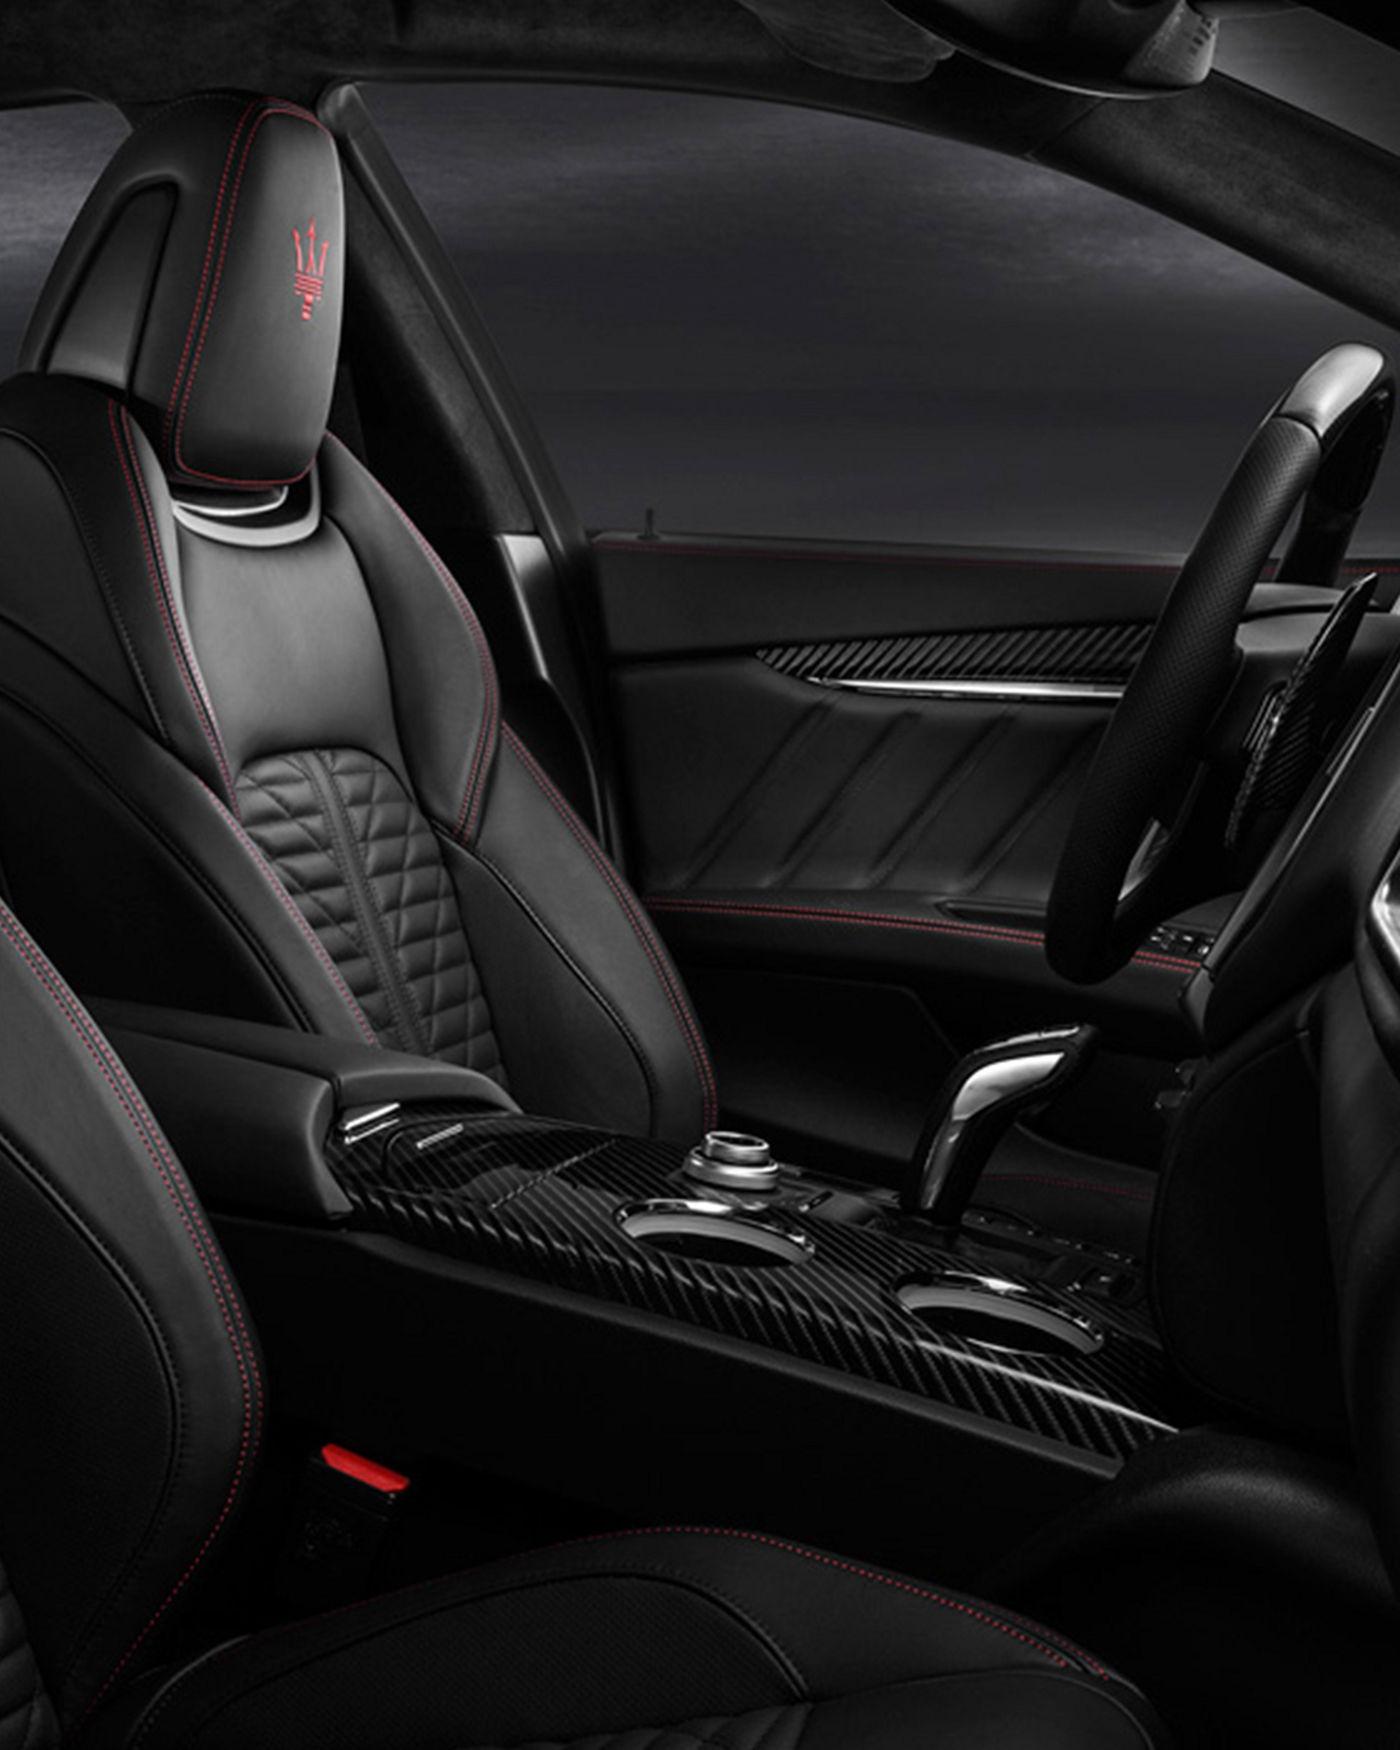 Maserati Ghibli GranSport interior – front seats